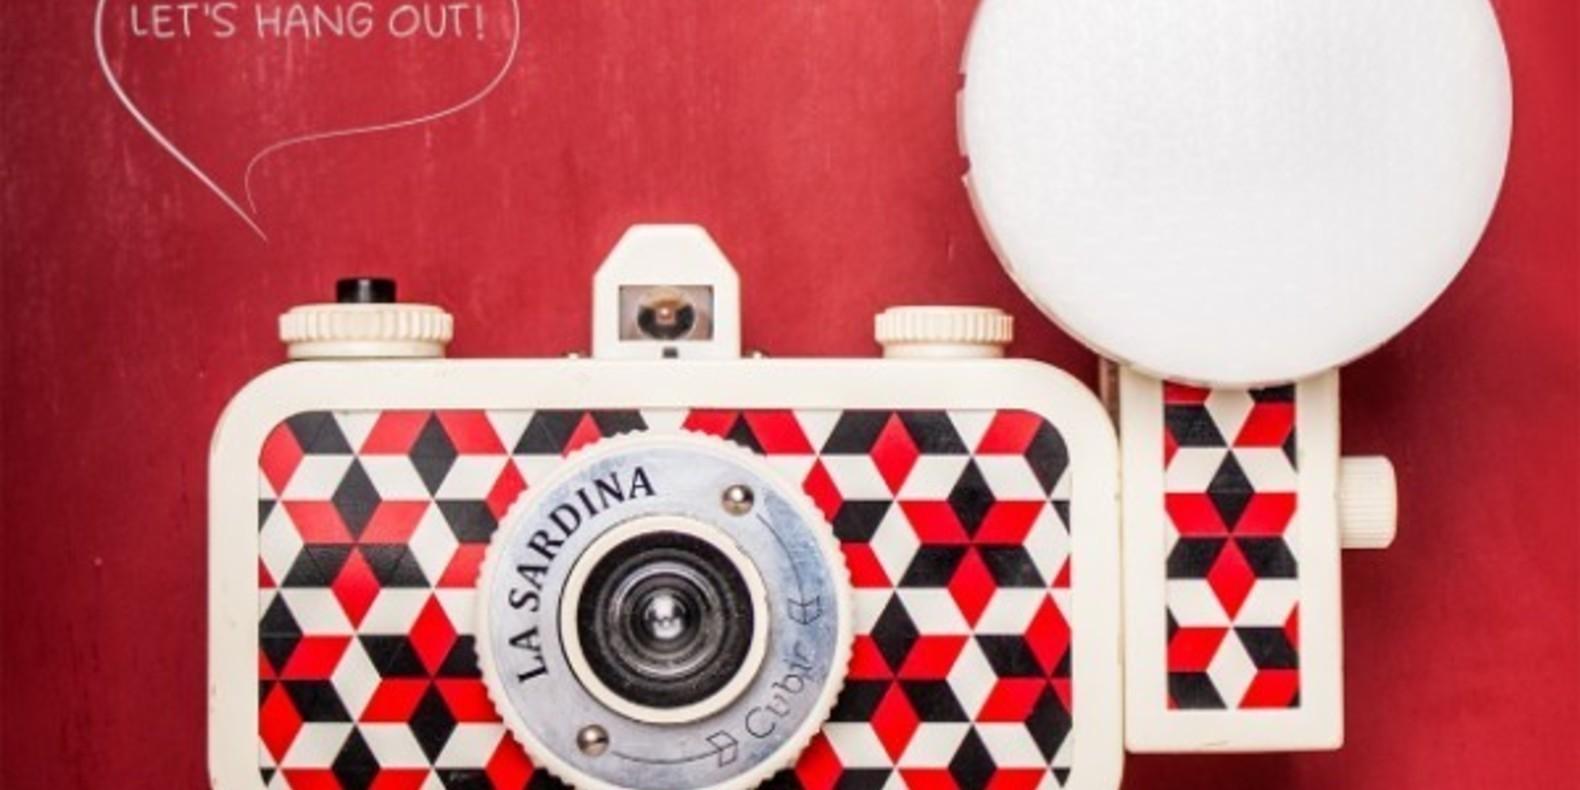 Hangie laudlab fichier 3D cults appareil photo camera 3